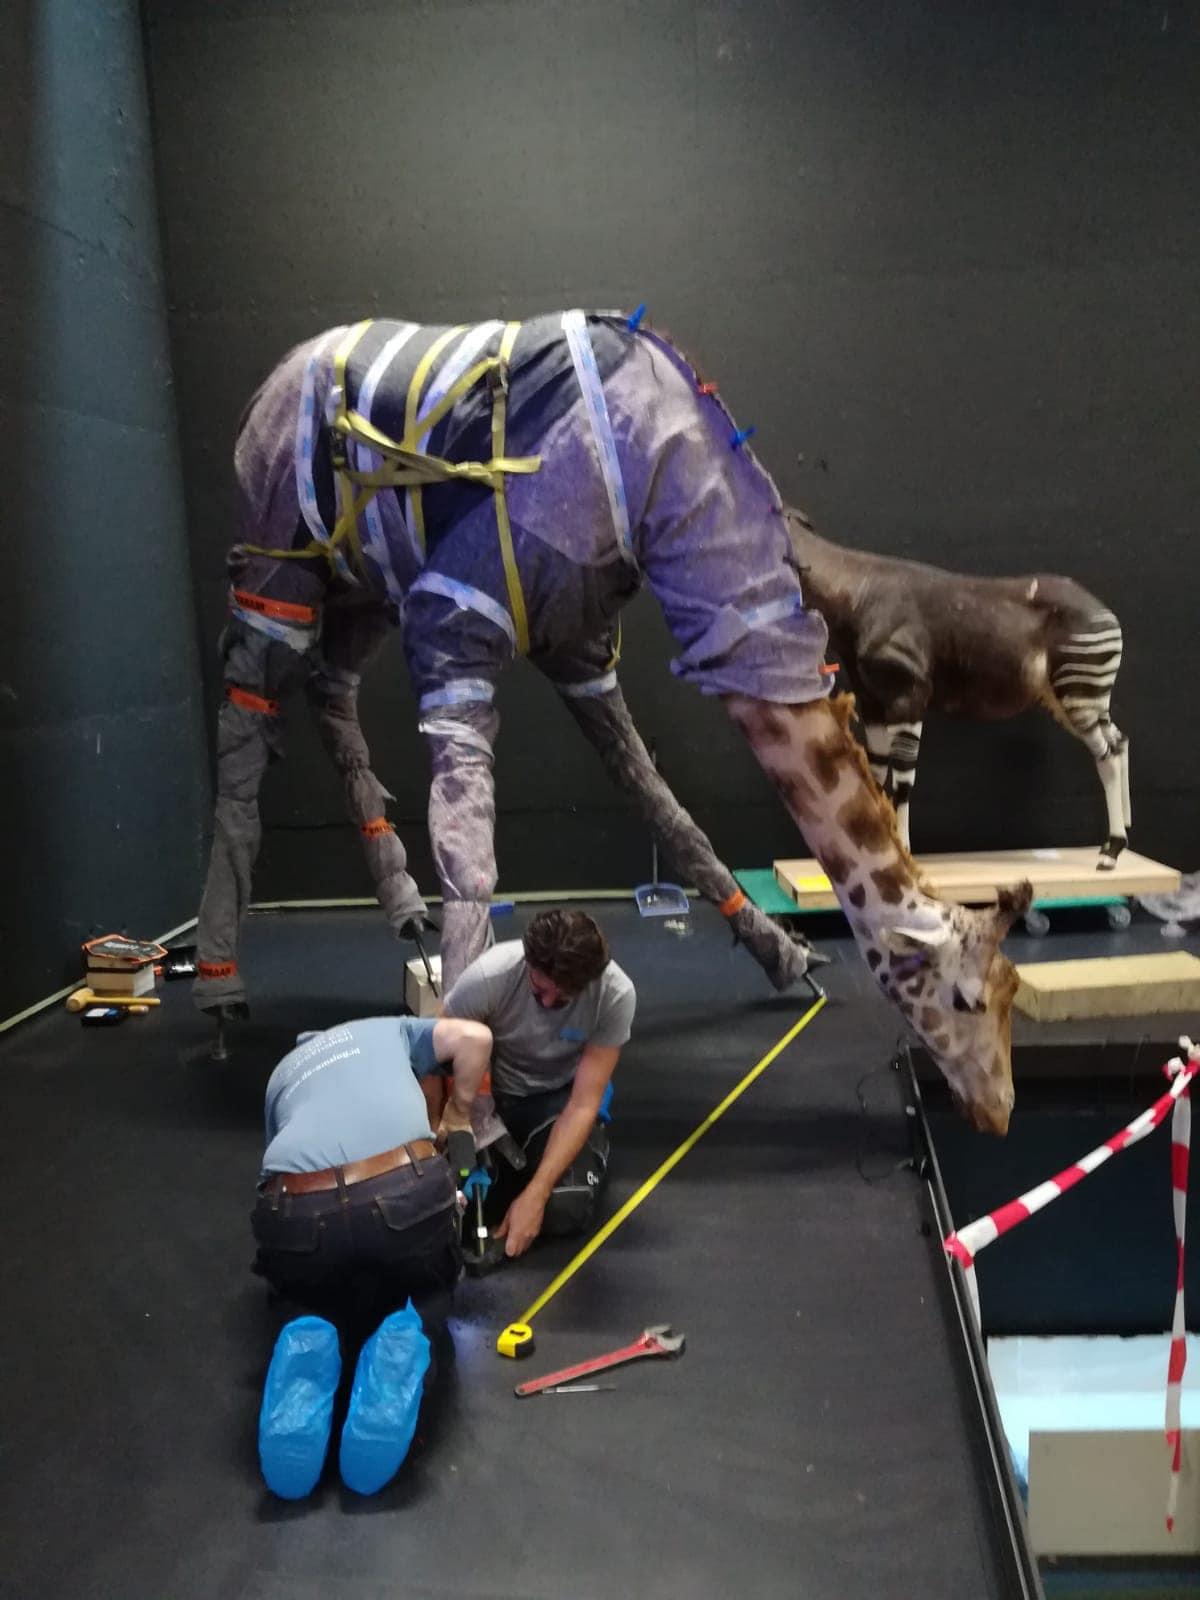 Huidpreparaten | drinkende giraffe II | Naturalis Biodiversity Center